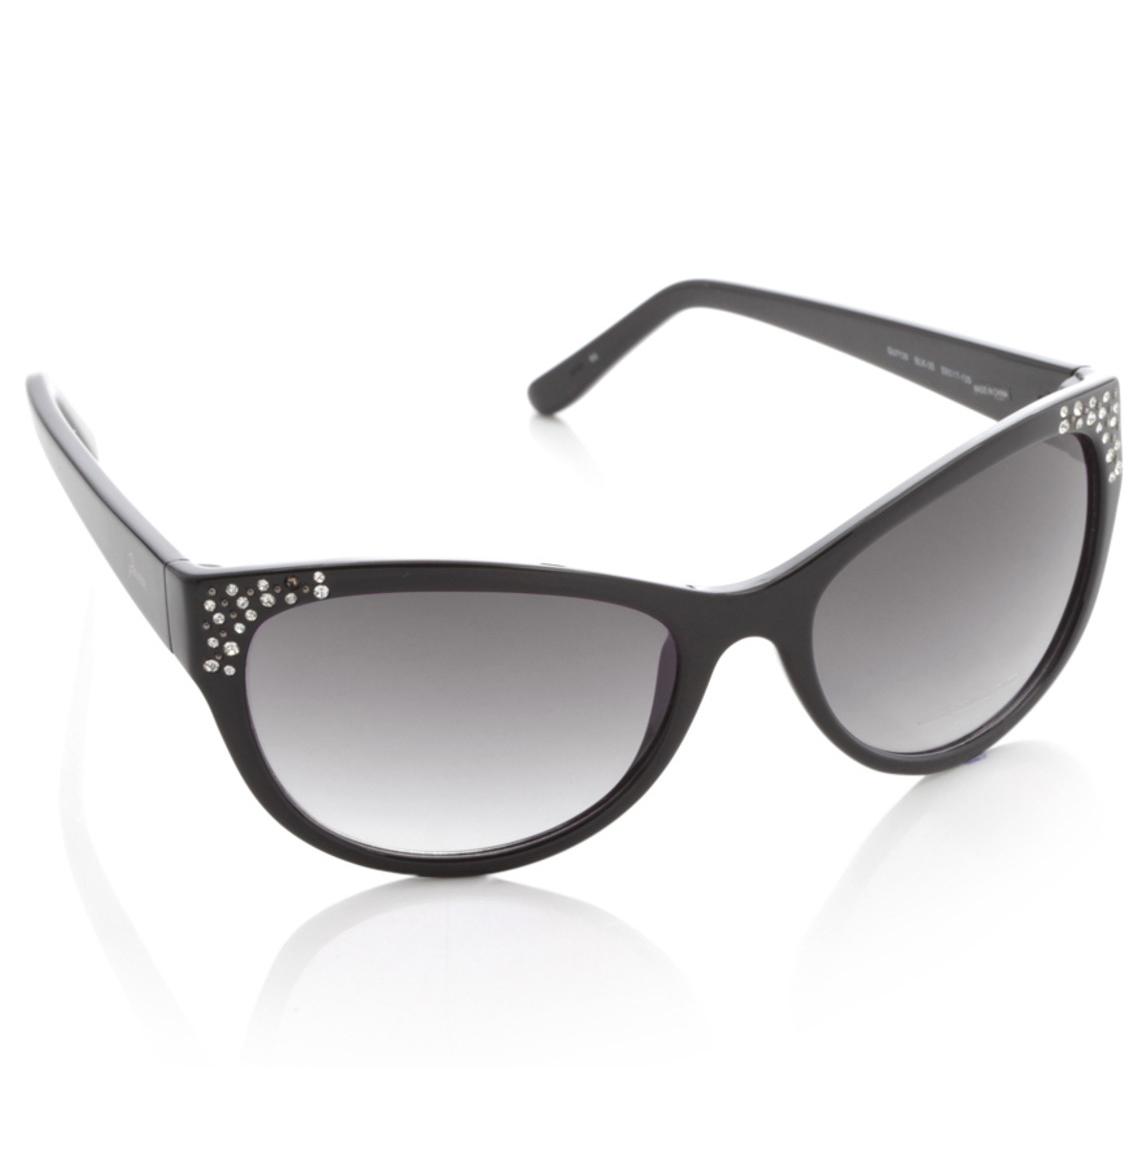 fd706204bc5 Guess Women  39 s Sunglasses - Tanga